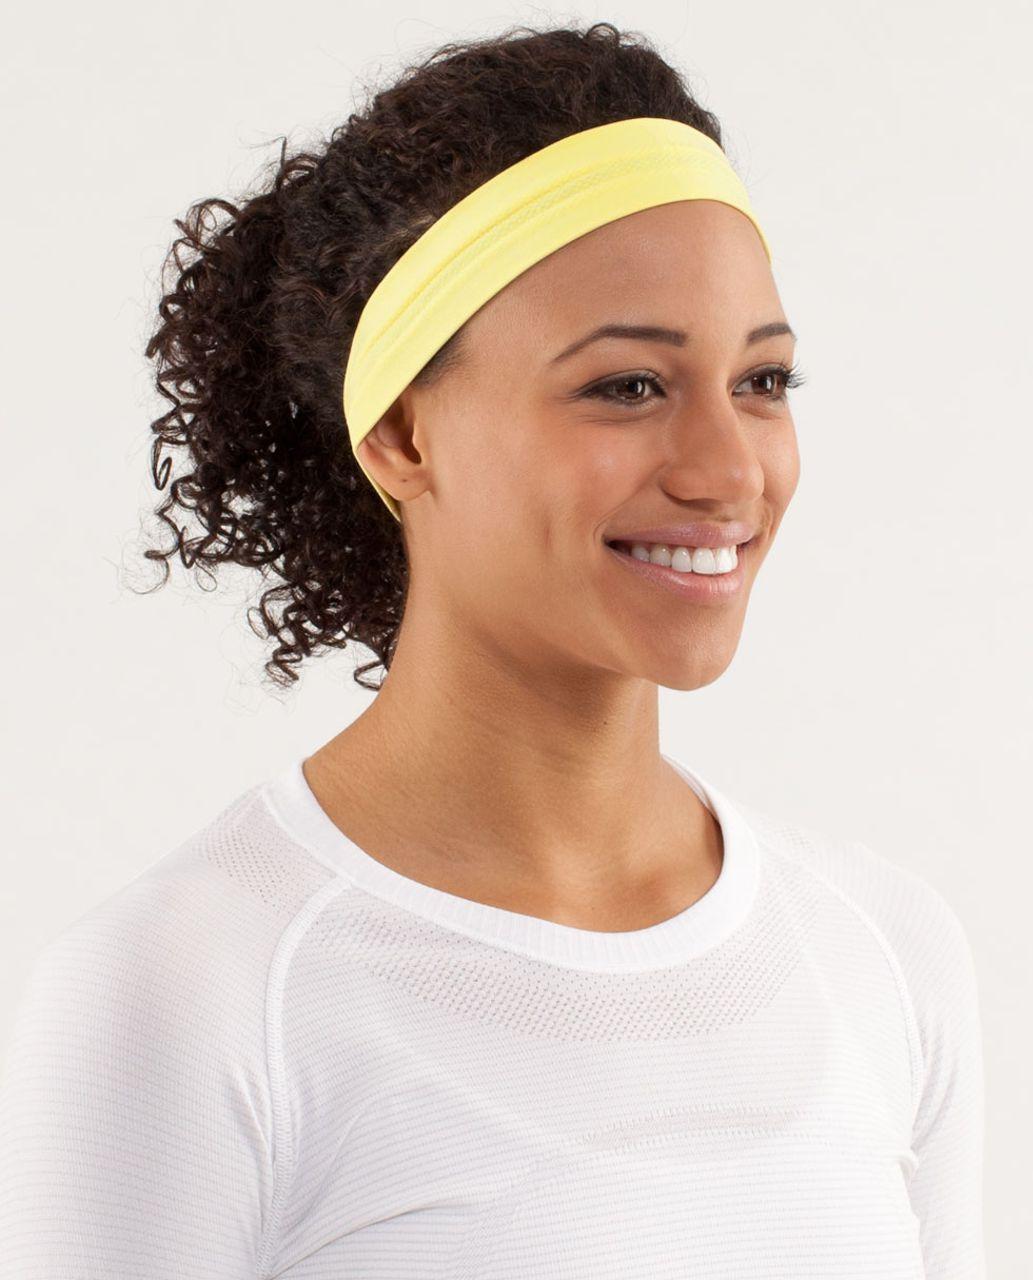 Lululemon Swiftly Headband - Mellow Lemon